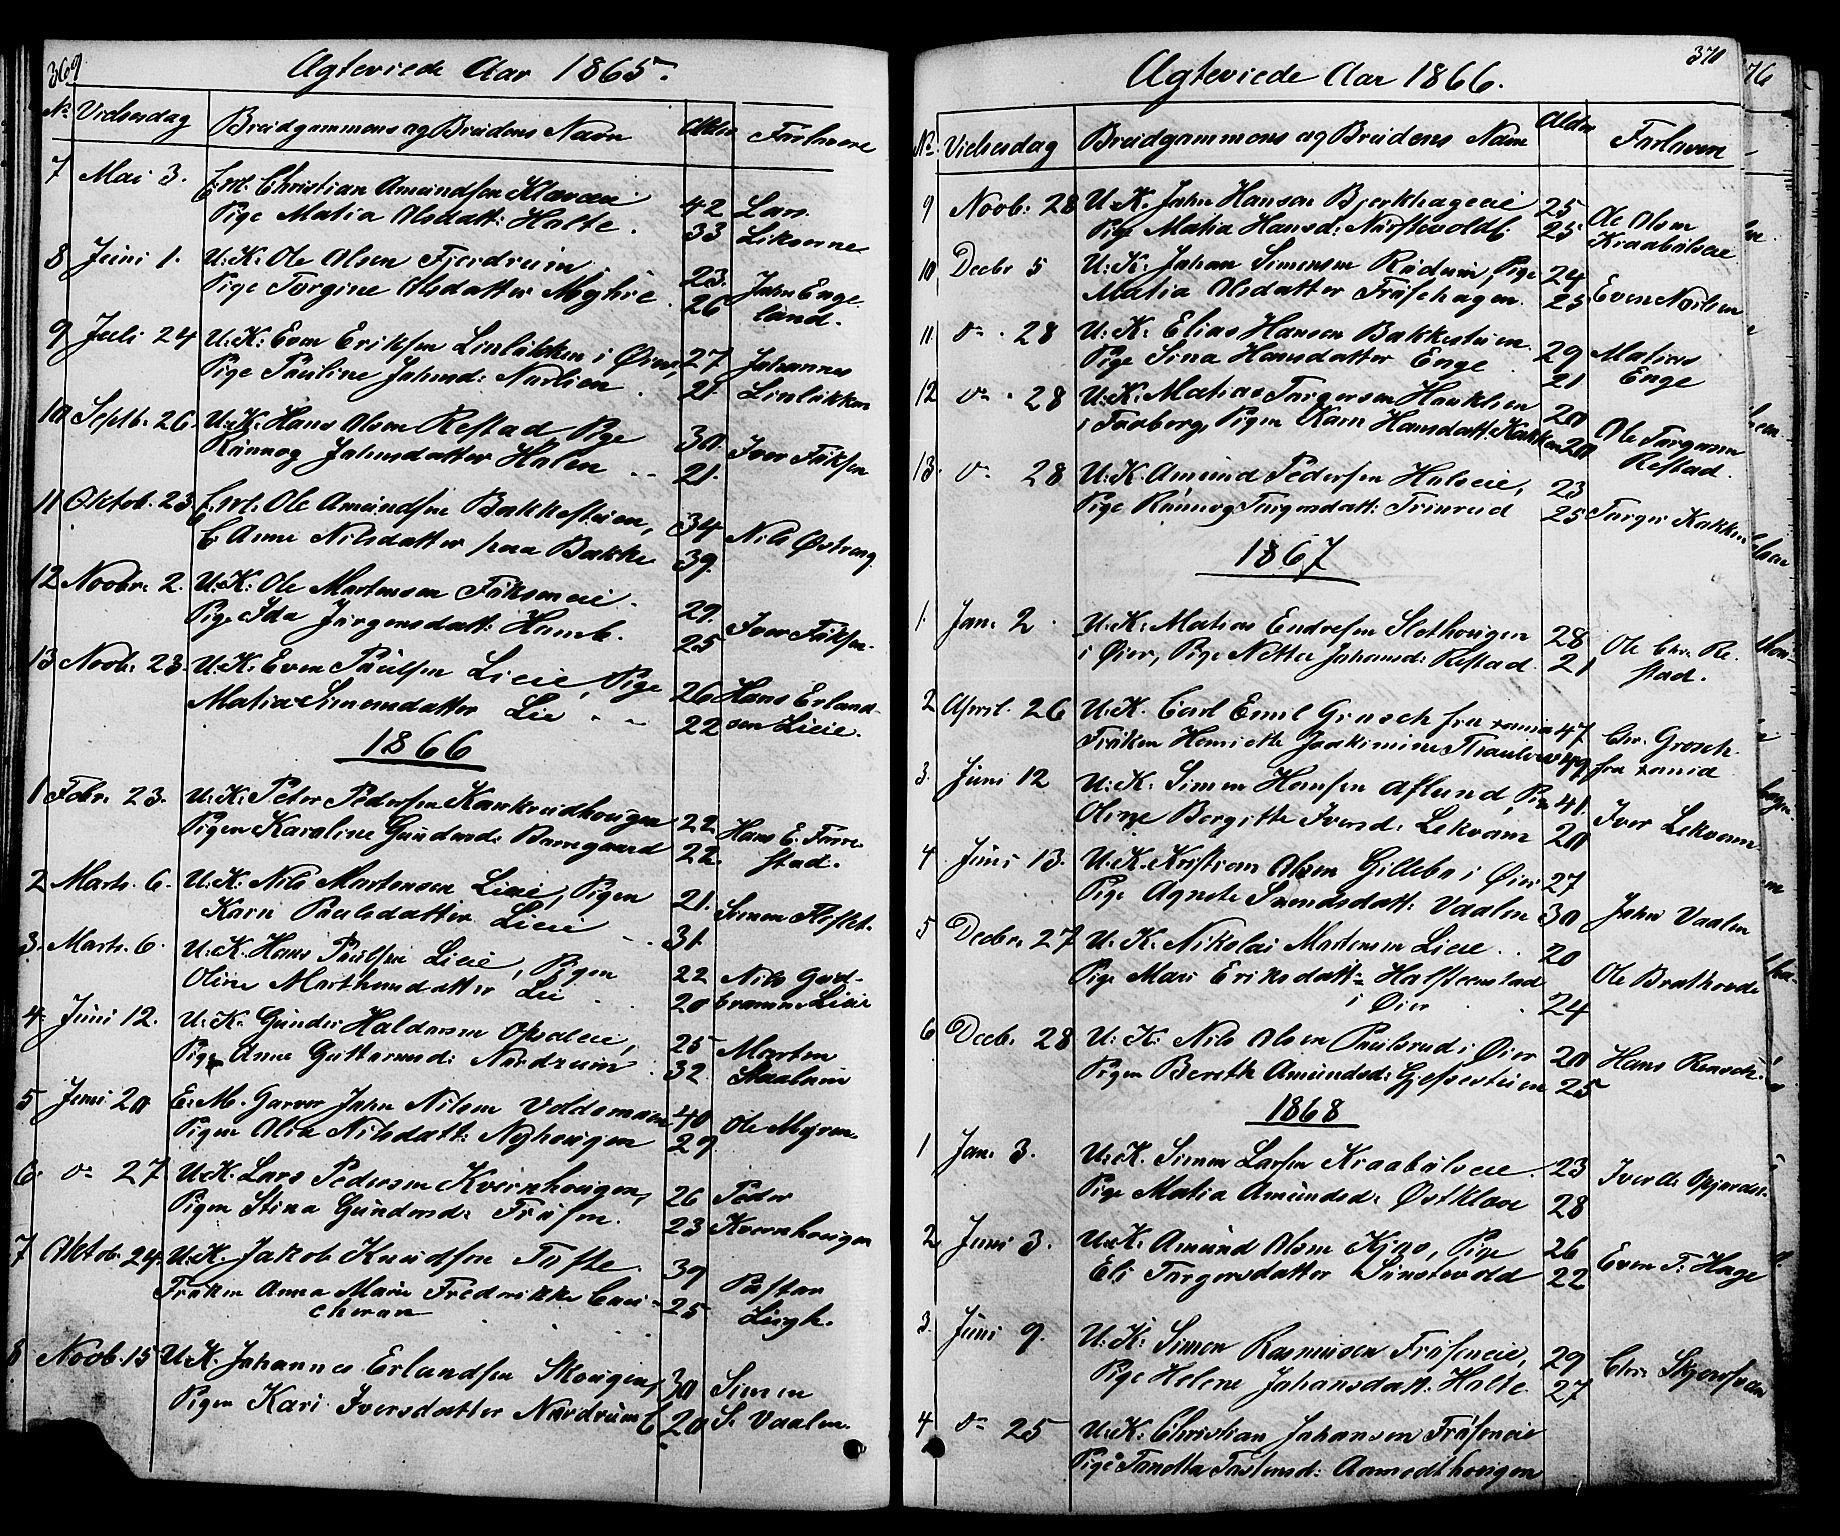 SAH, Østre Gausdal prestekontor, Klokkerbok nr. 1, 1863-1893, s. 369-370